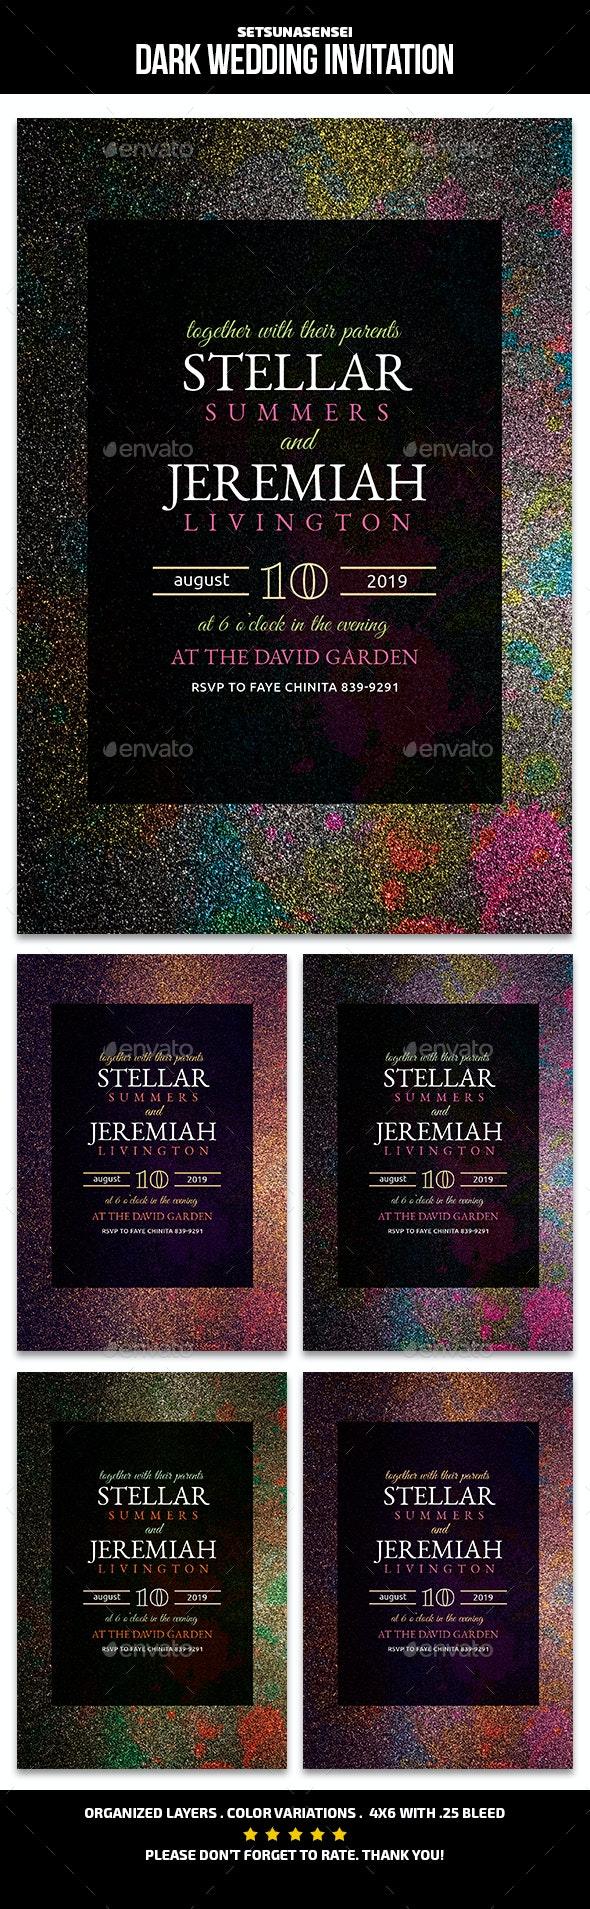 Dark Wedding Invitation - Weddings Cards & Invites